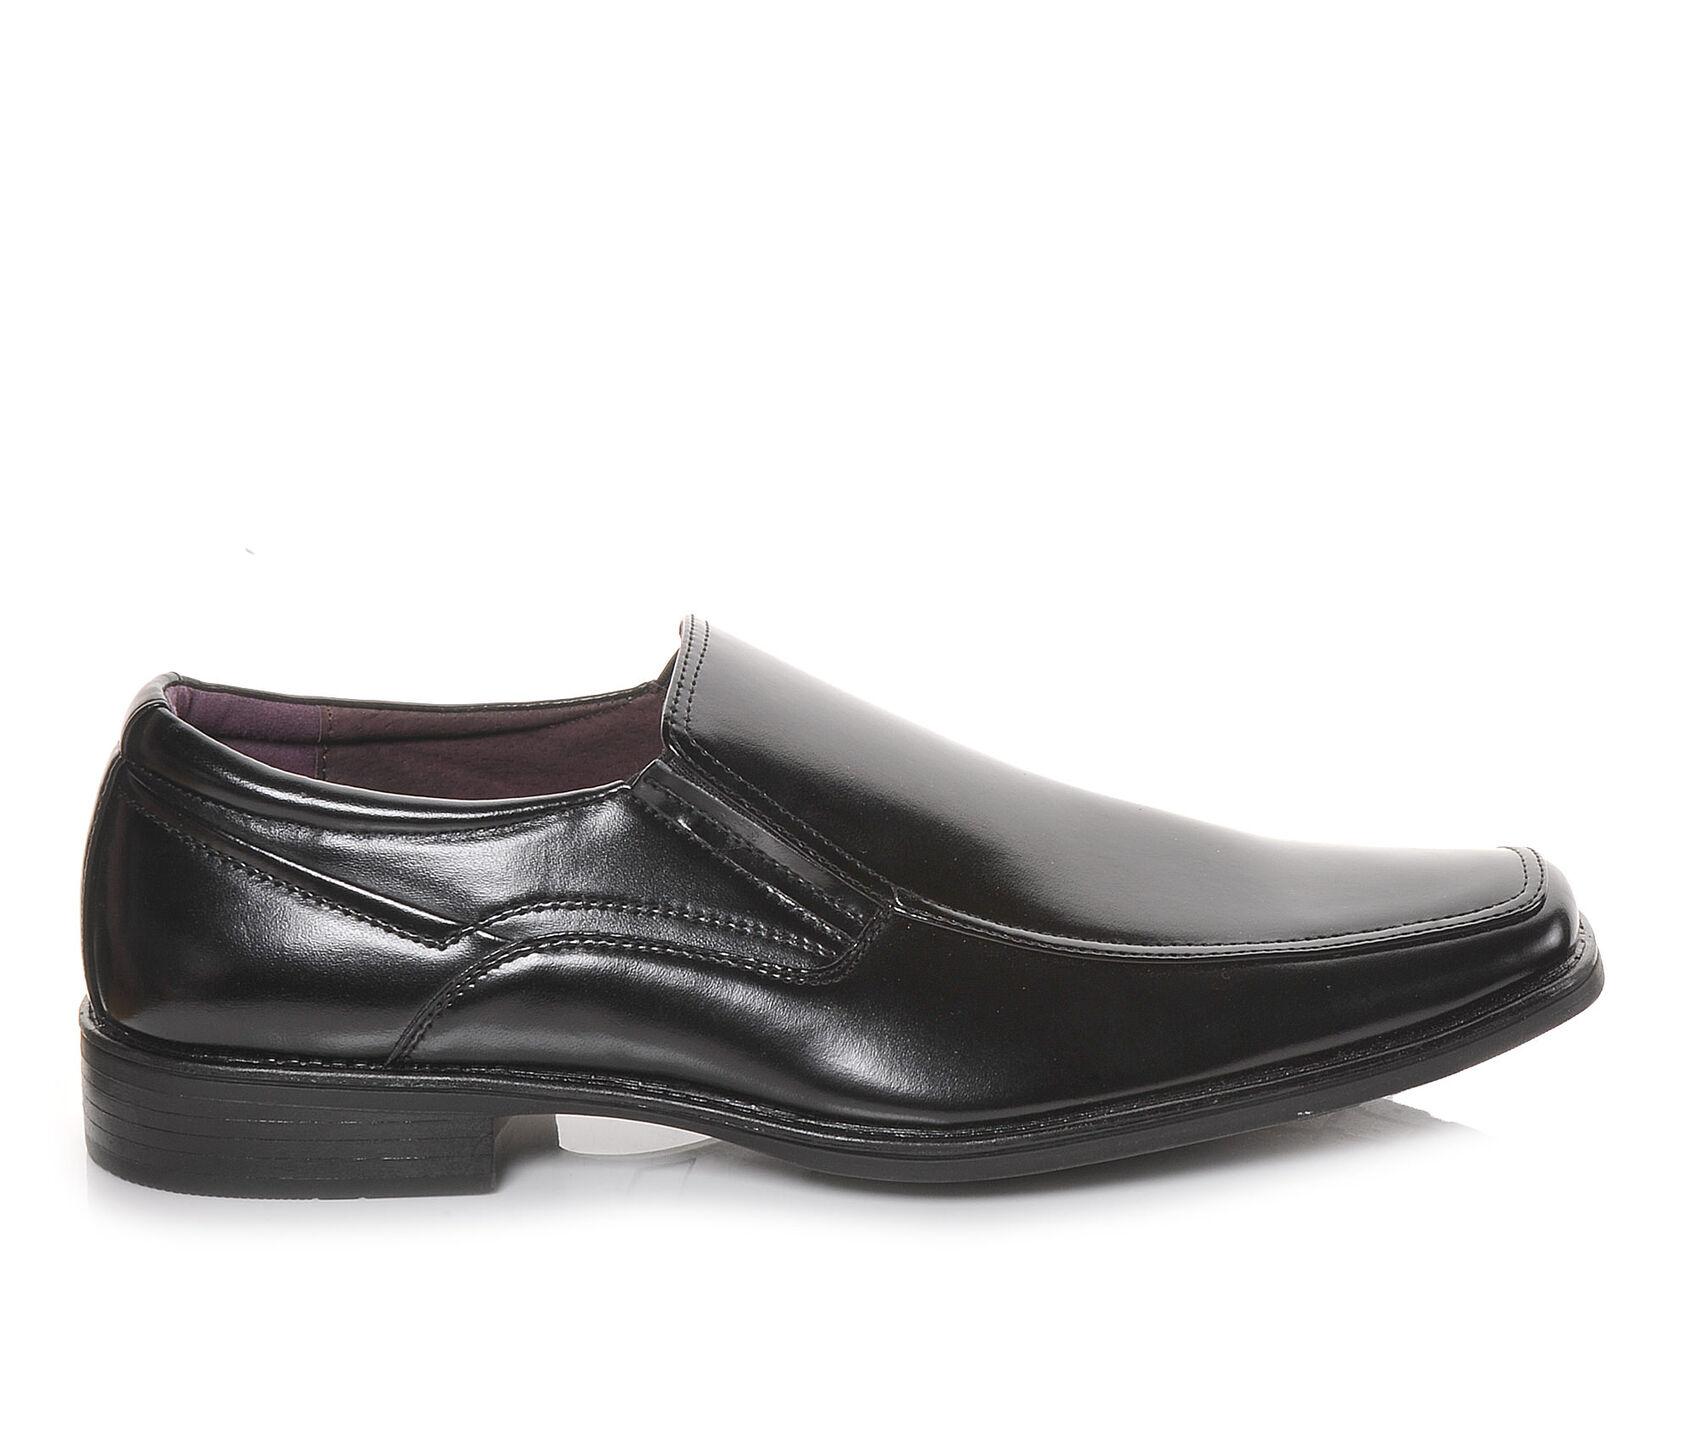 Freeman Boys Dress Shoes Shoe Carnival